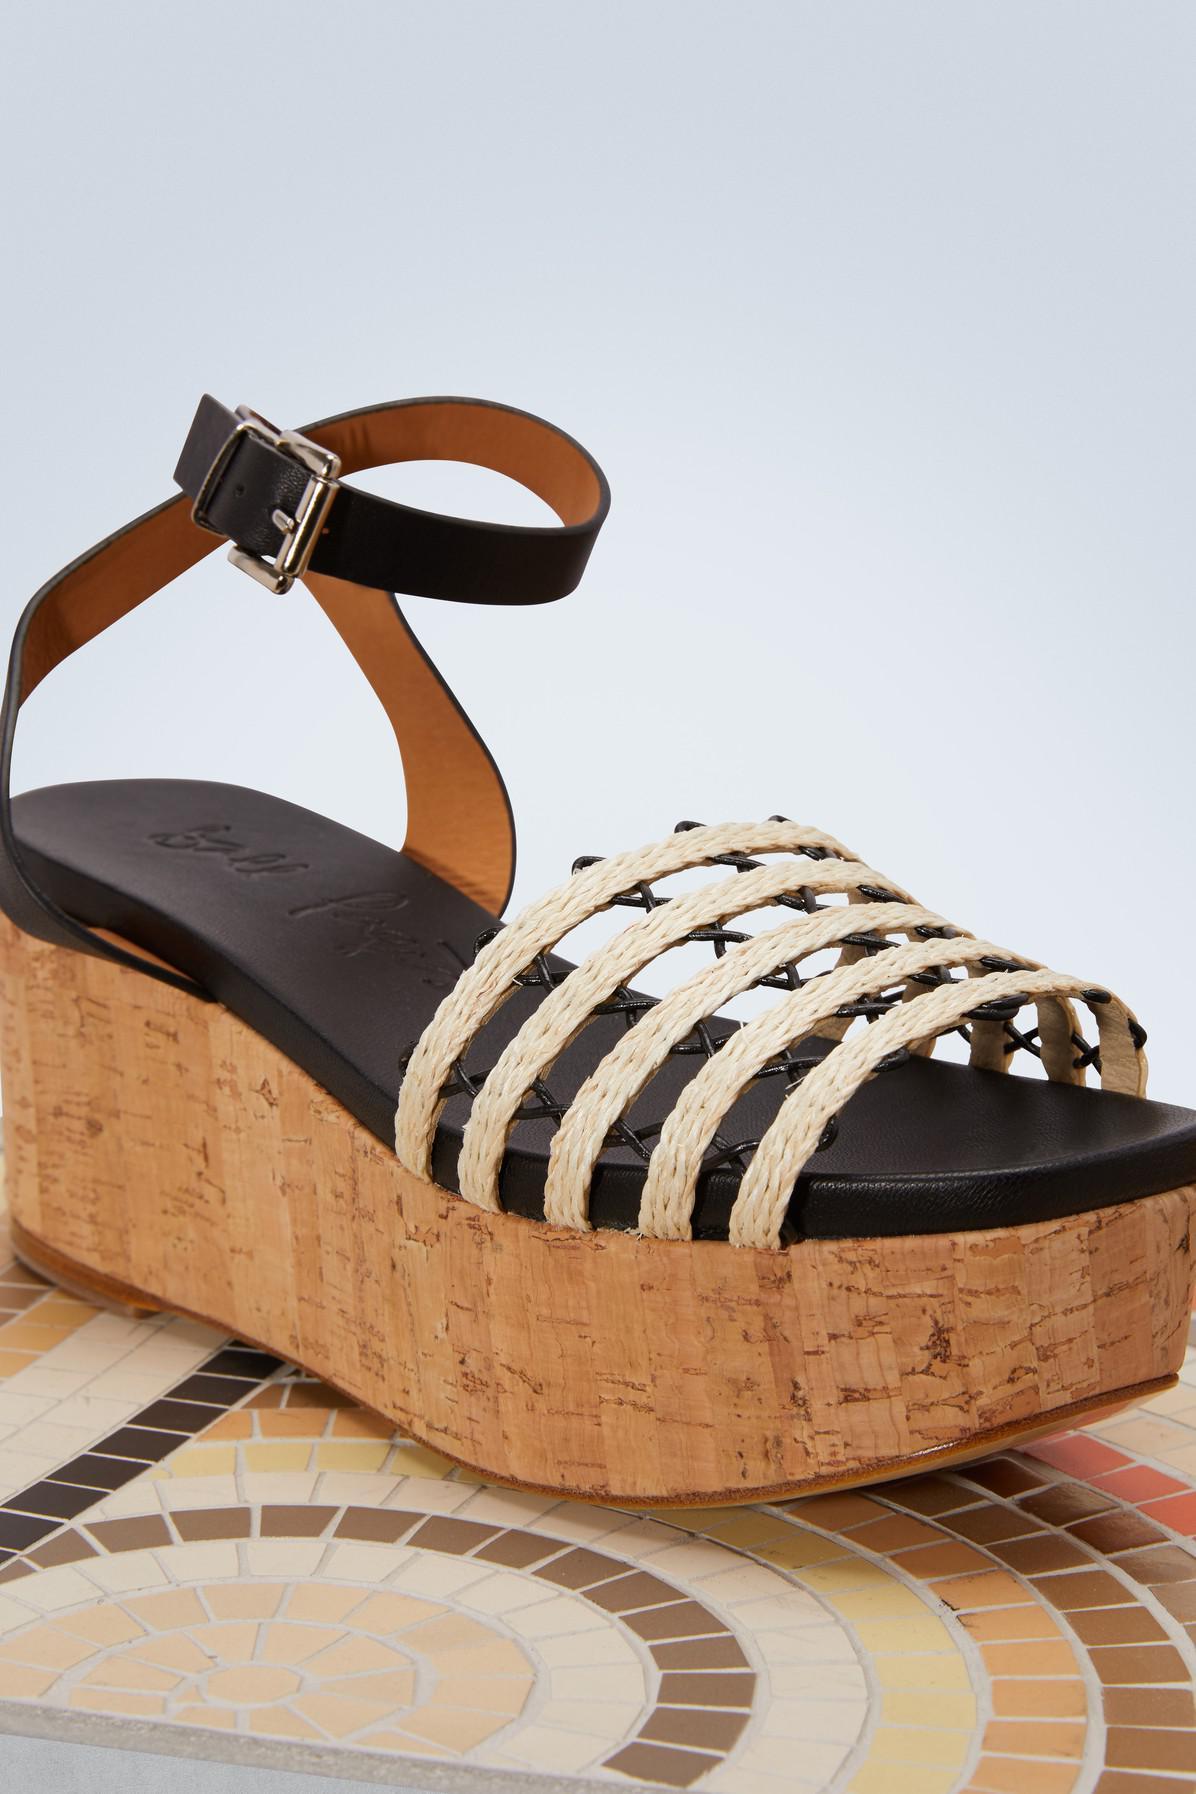 BALL PAGES Marquesa platform sandals 8qkhydF6jM